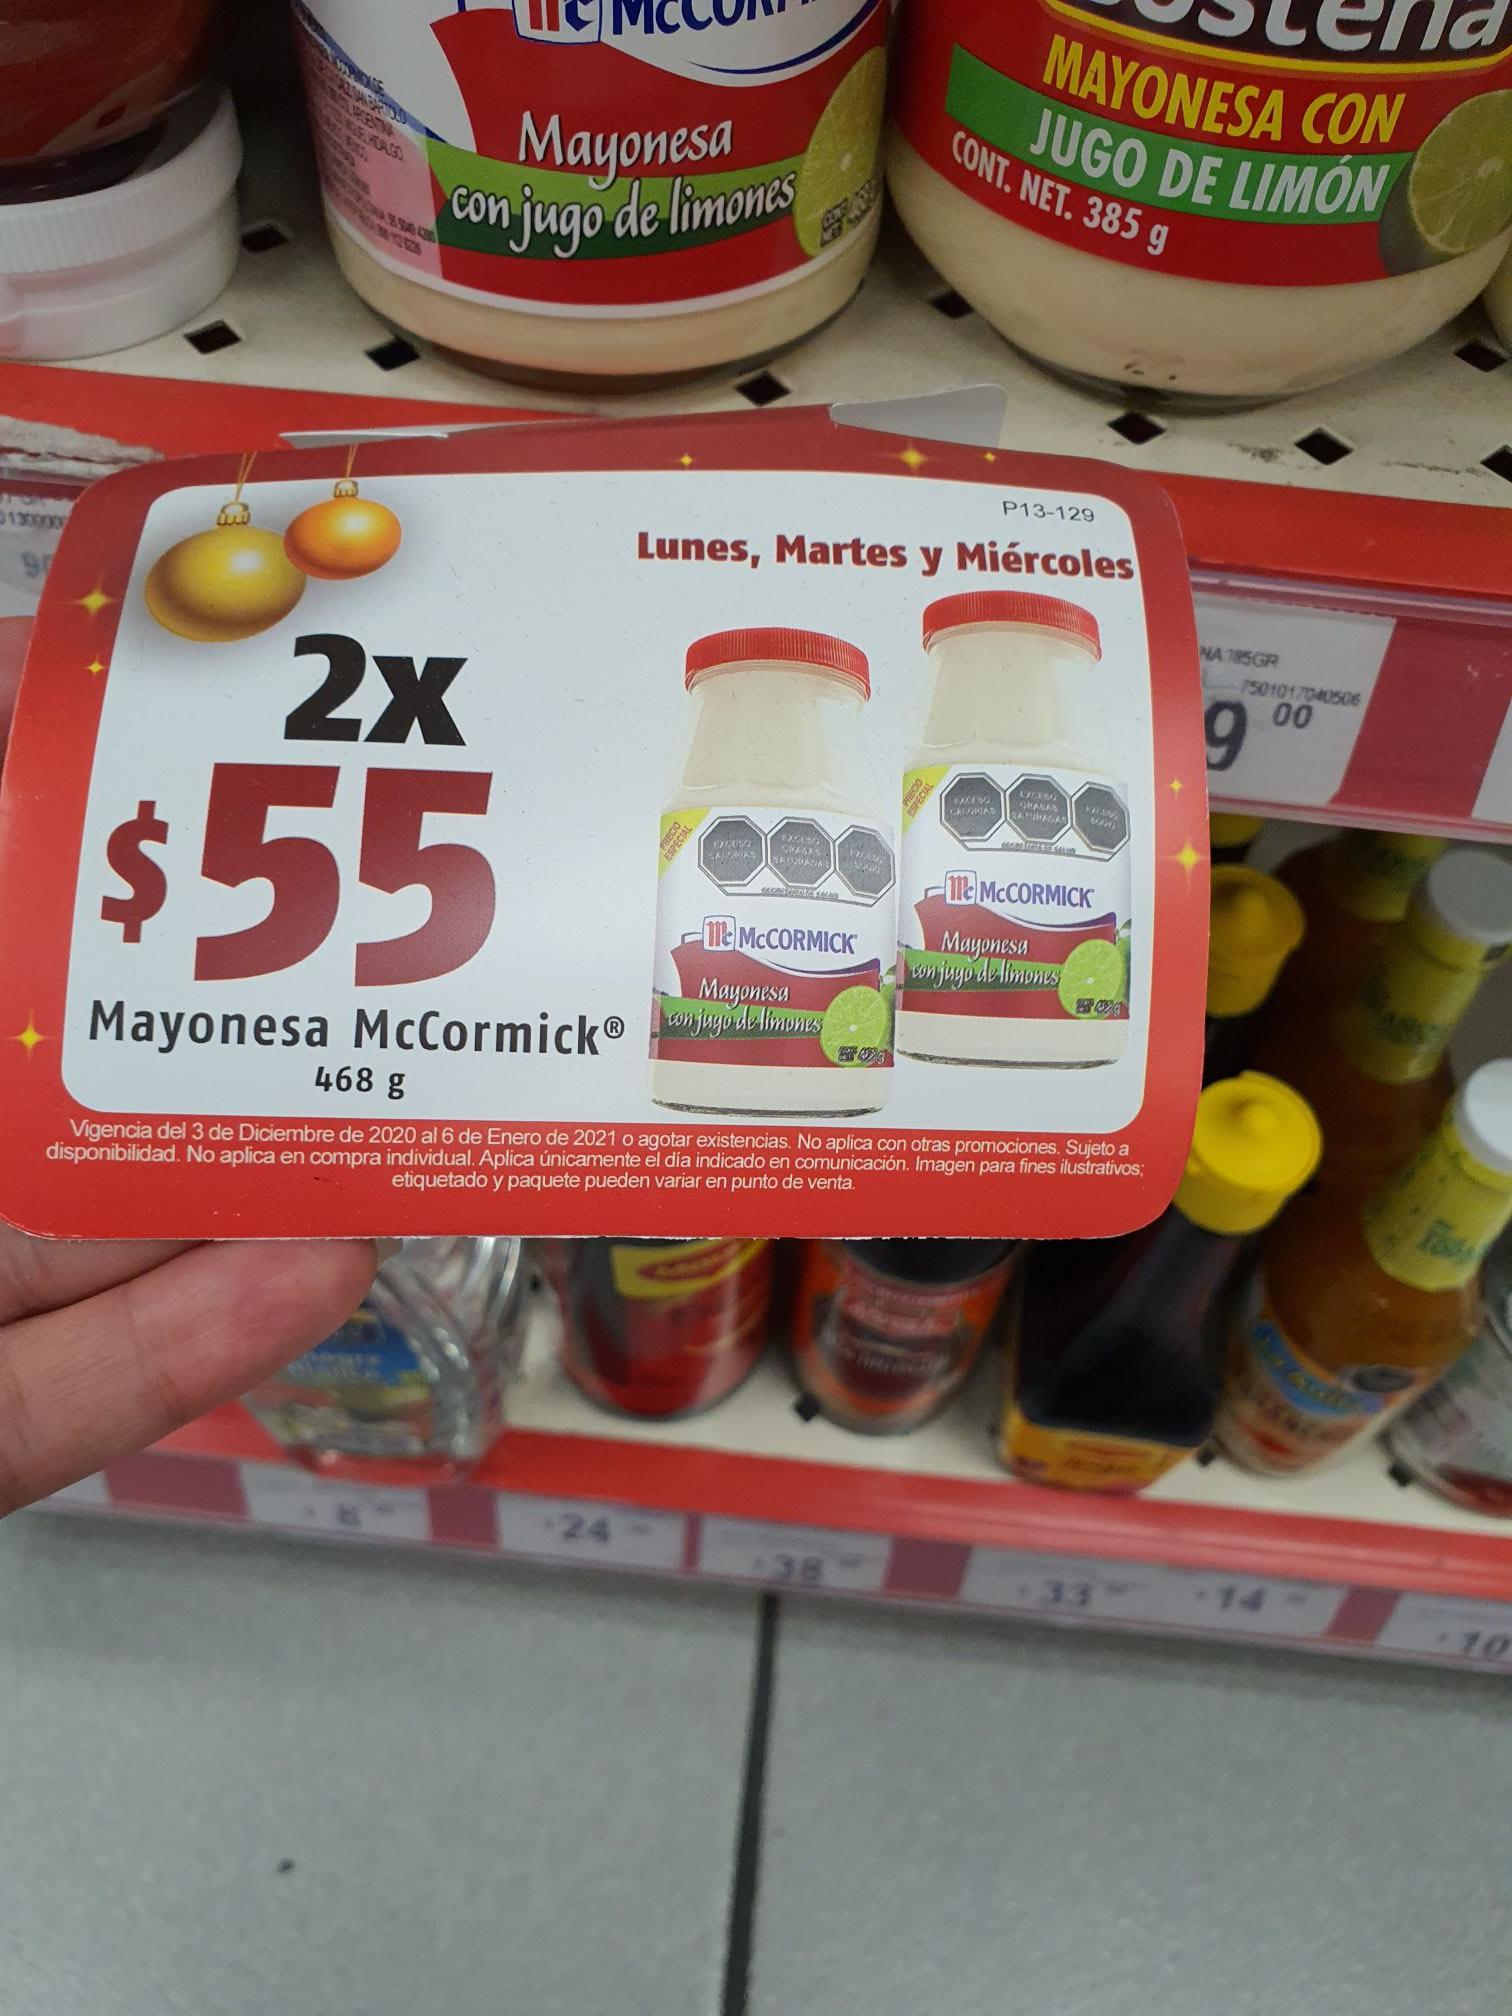 Oxxo 2 mayonesas mccormick 468 gr X $55